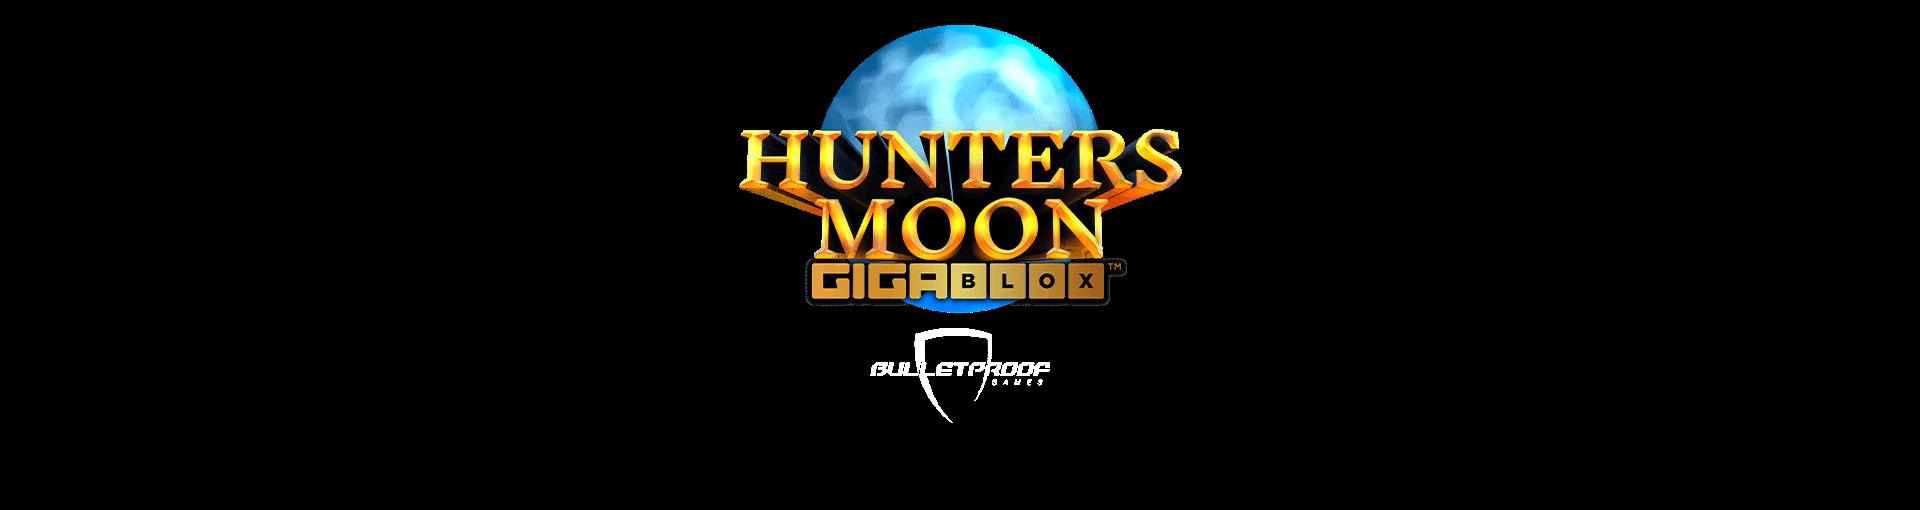 hunters_moon_gigablox_Yggdrasil-UpcomingGame-Logo-Template-1920x510px